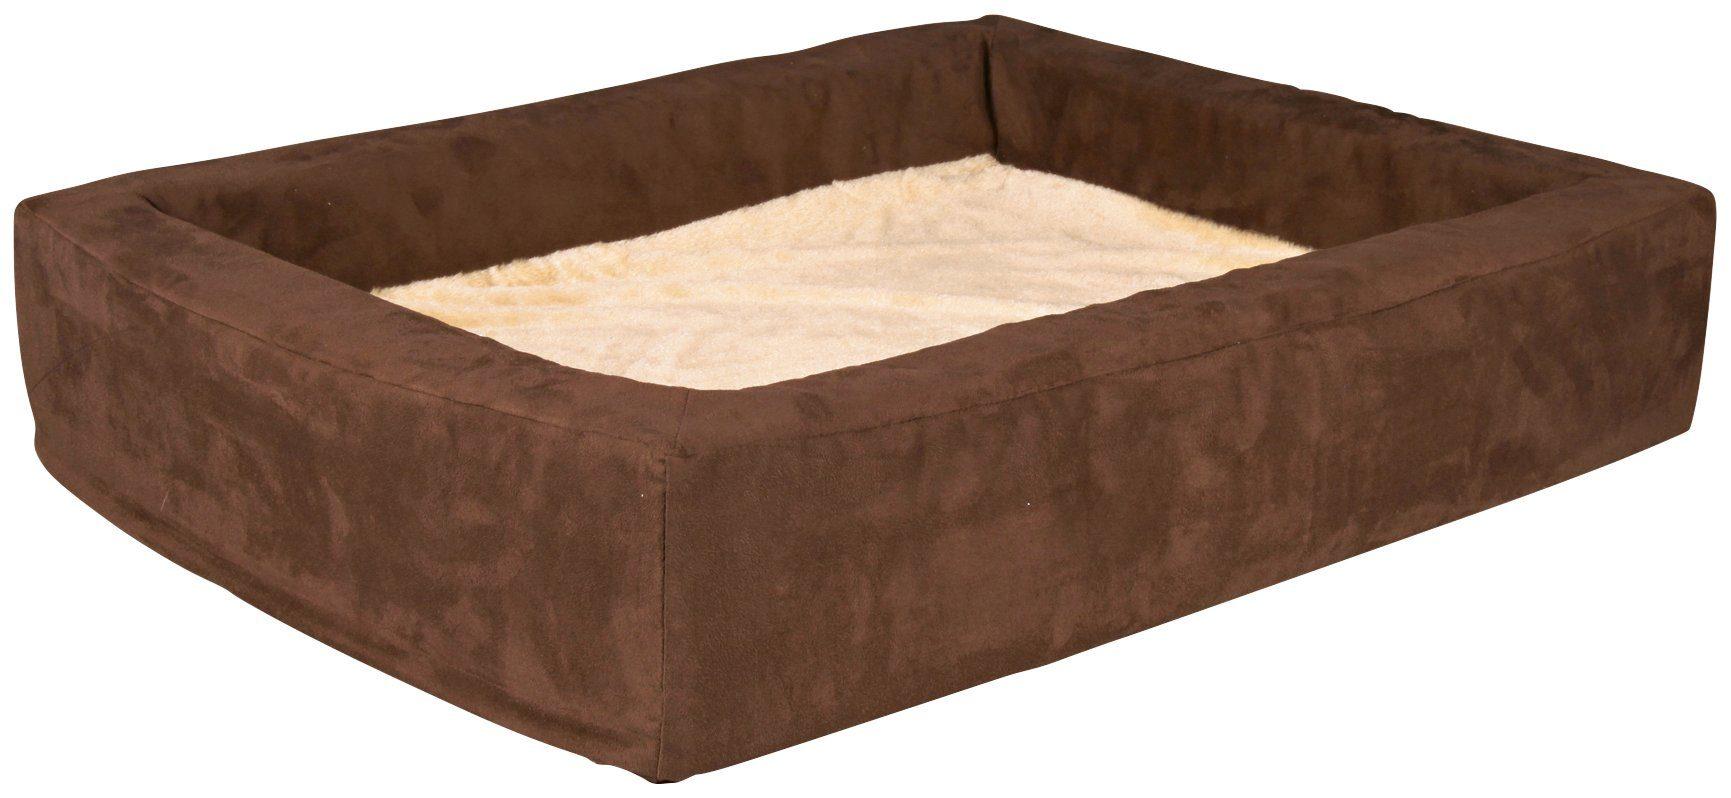 Hunde-Bett »Vital Bett Memory«, BxL: 100x80 cm, braun/beige